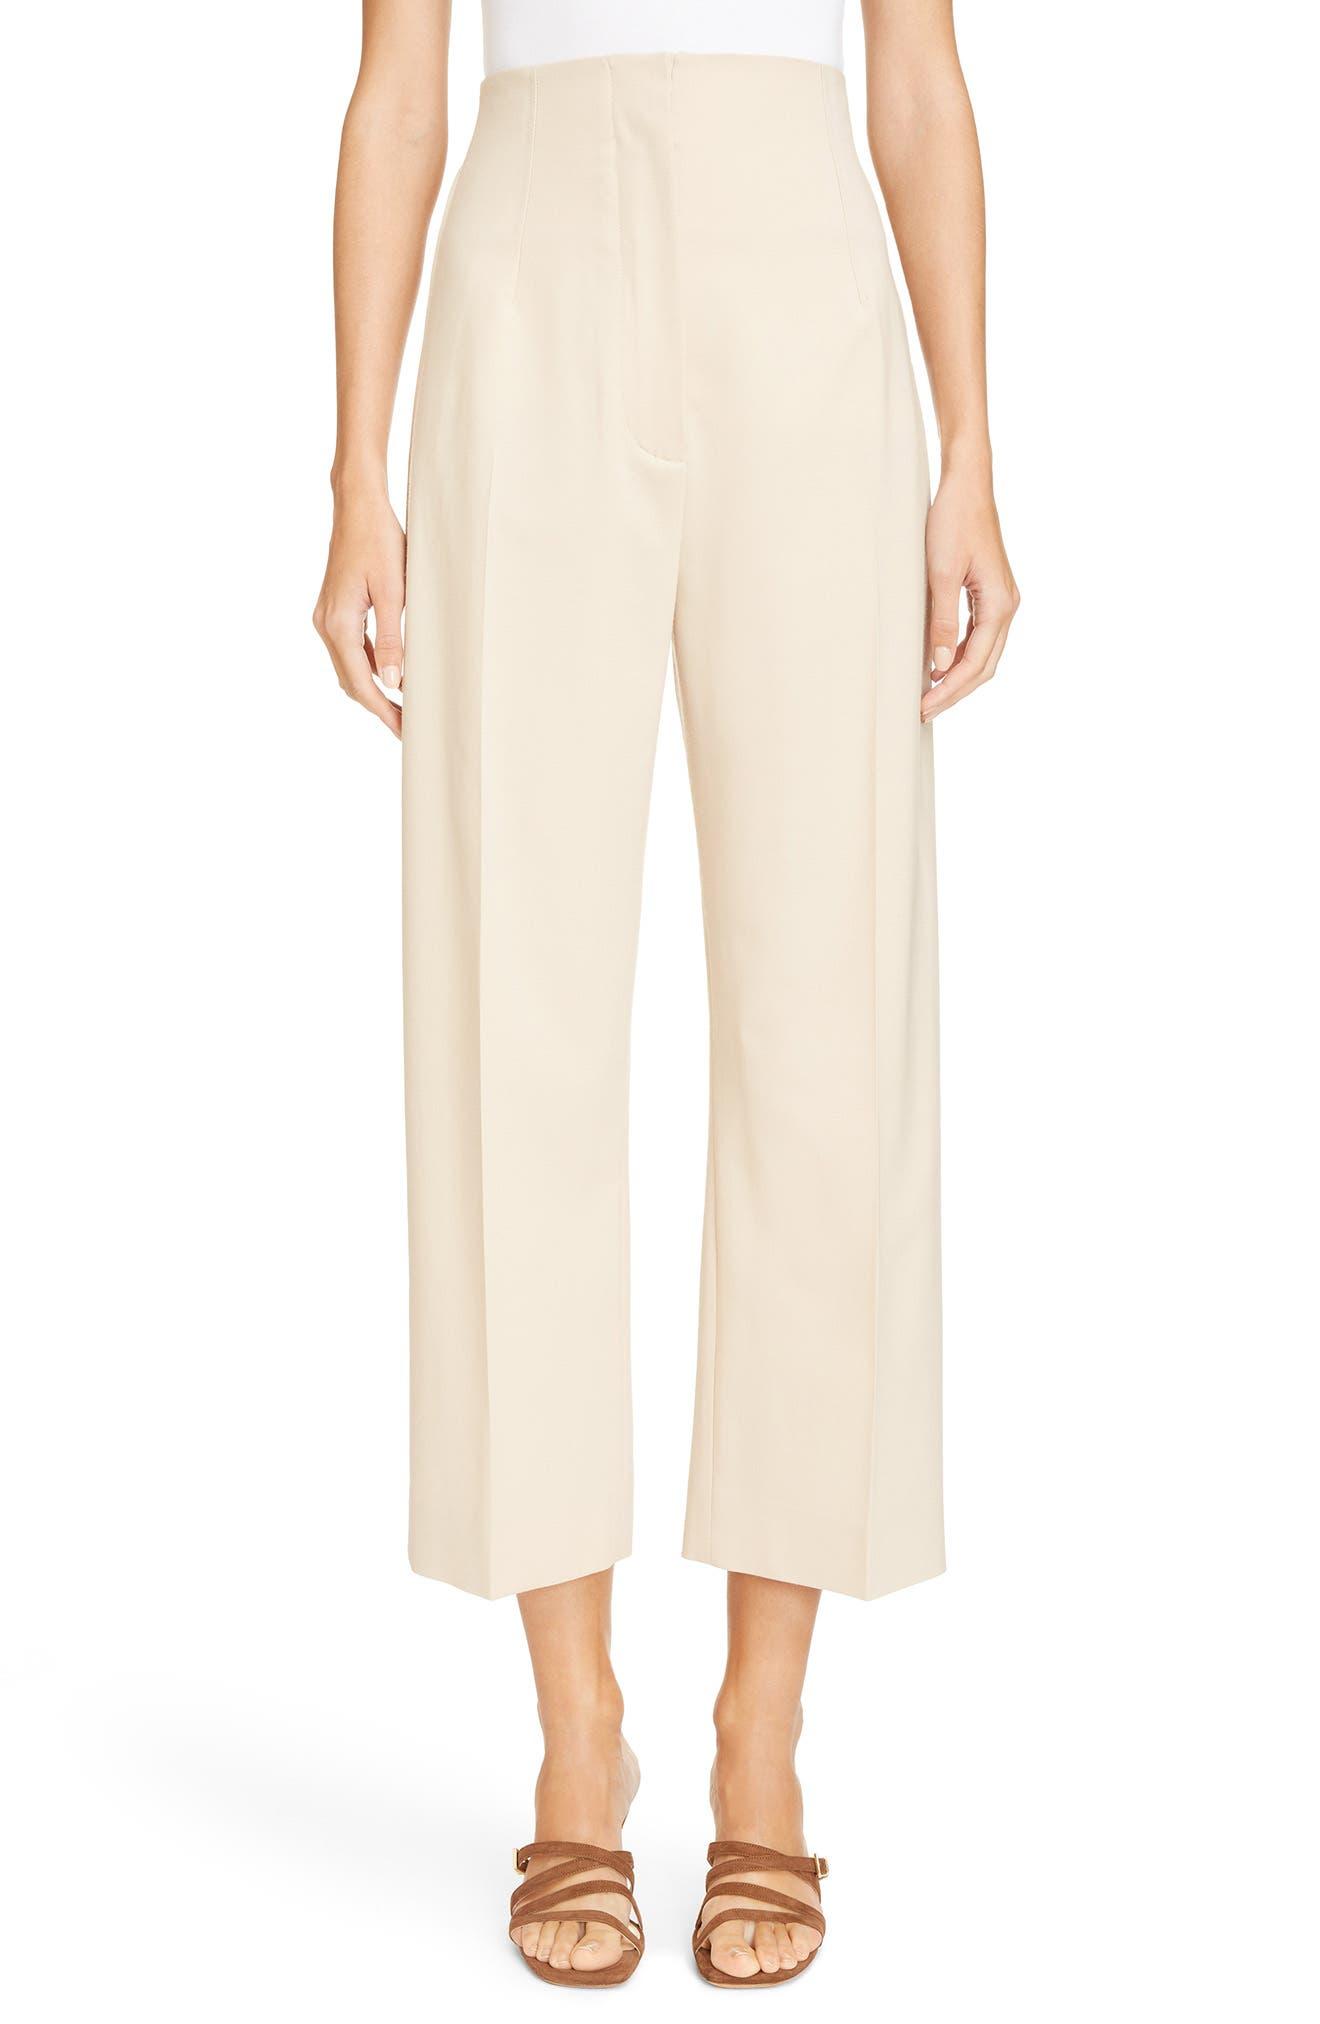 Le Pantalon Droit High Waist Crop Pants,                             Main thumbnail 1, color,                             250